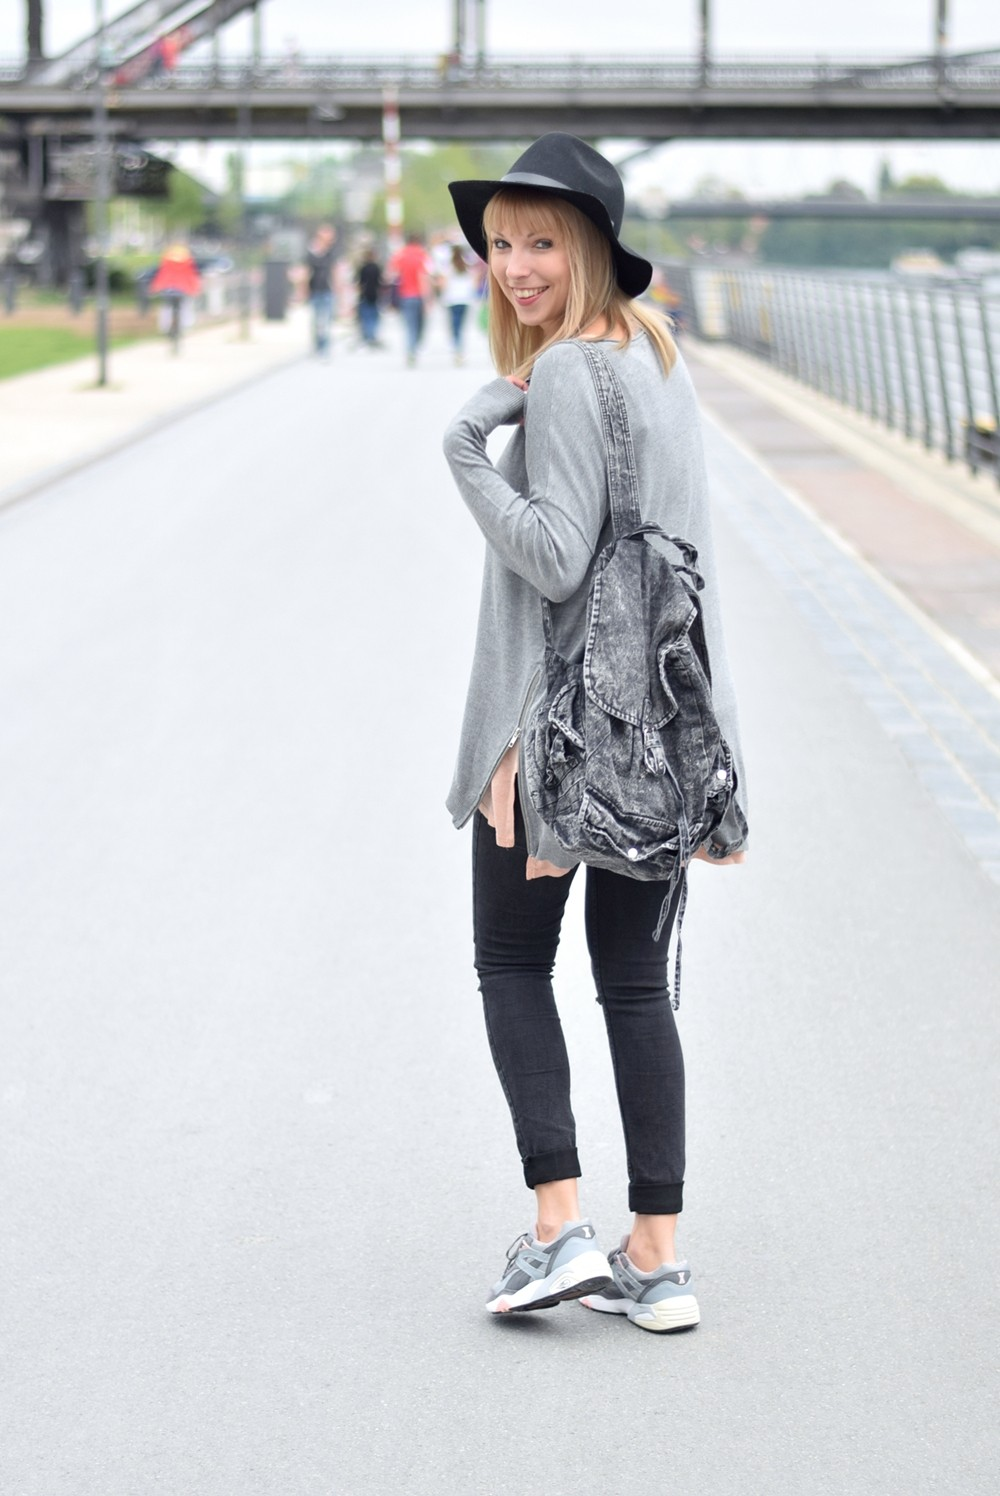 Puma Vashtie Outfit grau Jeans Sweater 10